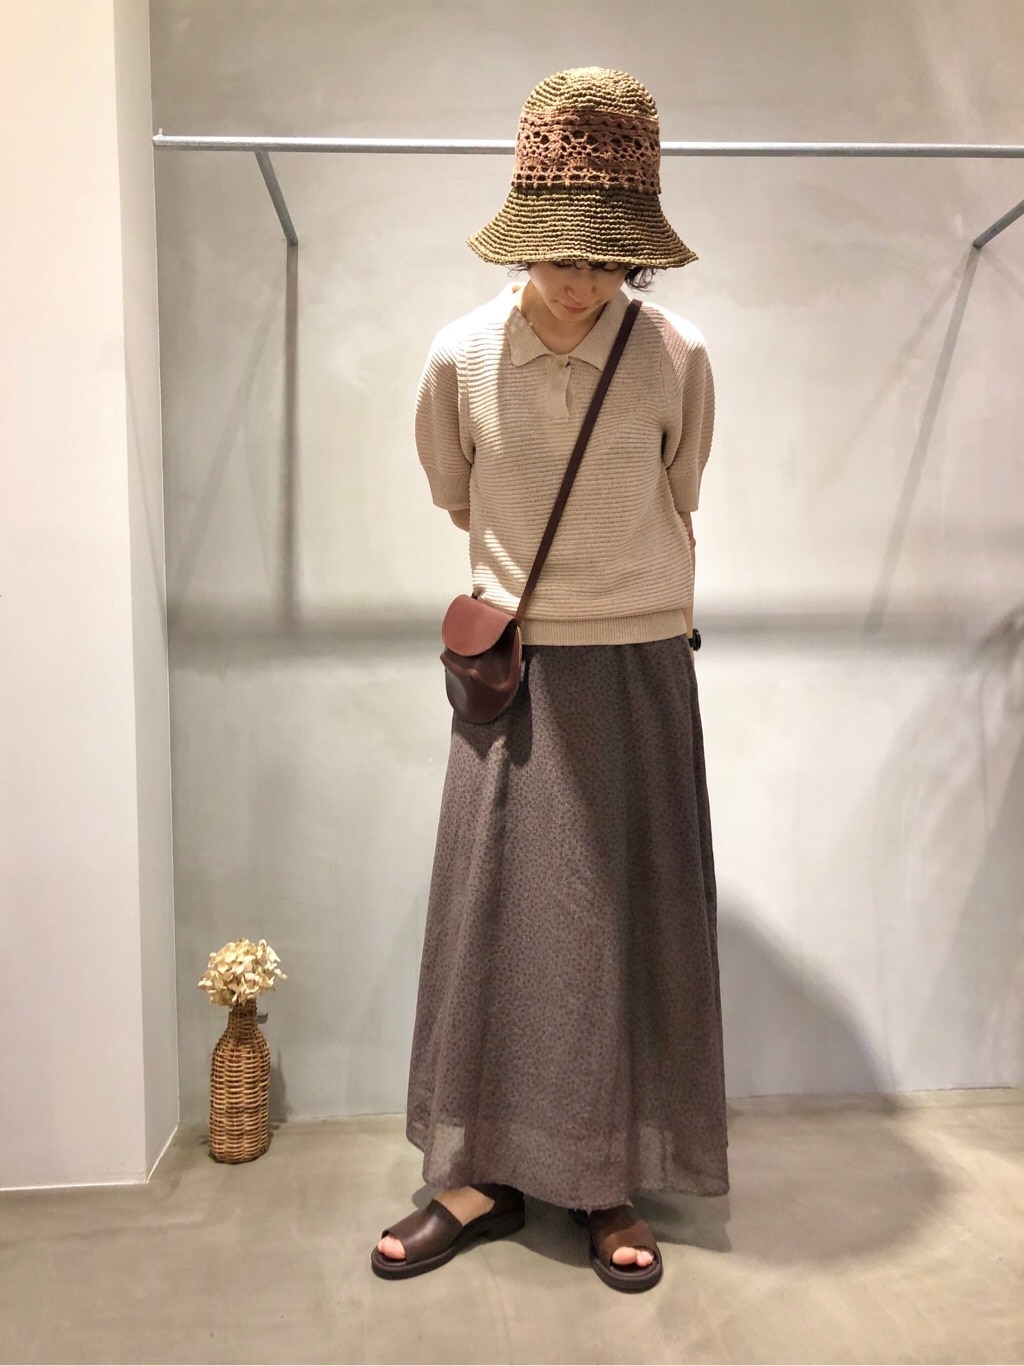 yuni / bulle de savon 京都路面 身長:159cm 2020.07.31